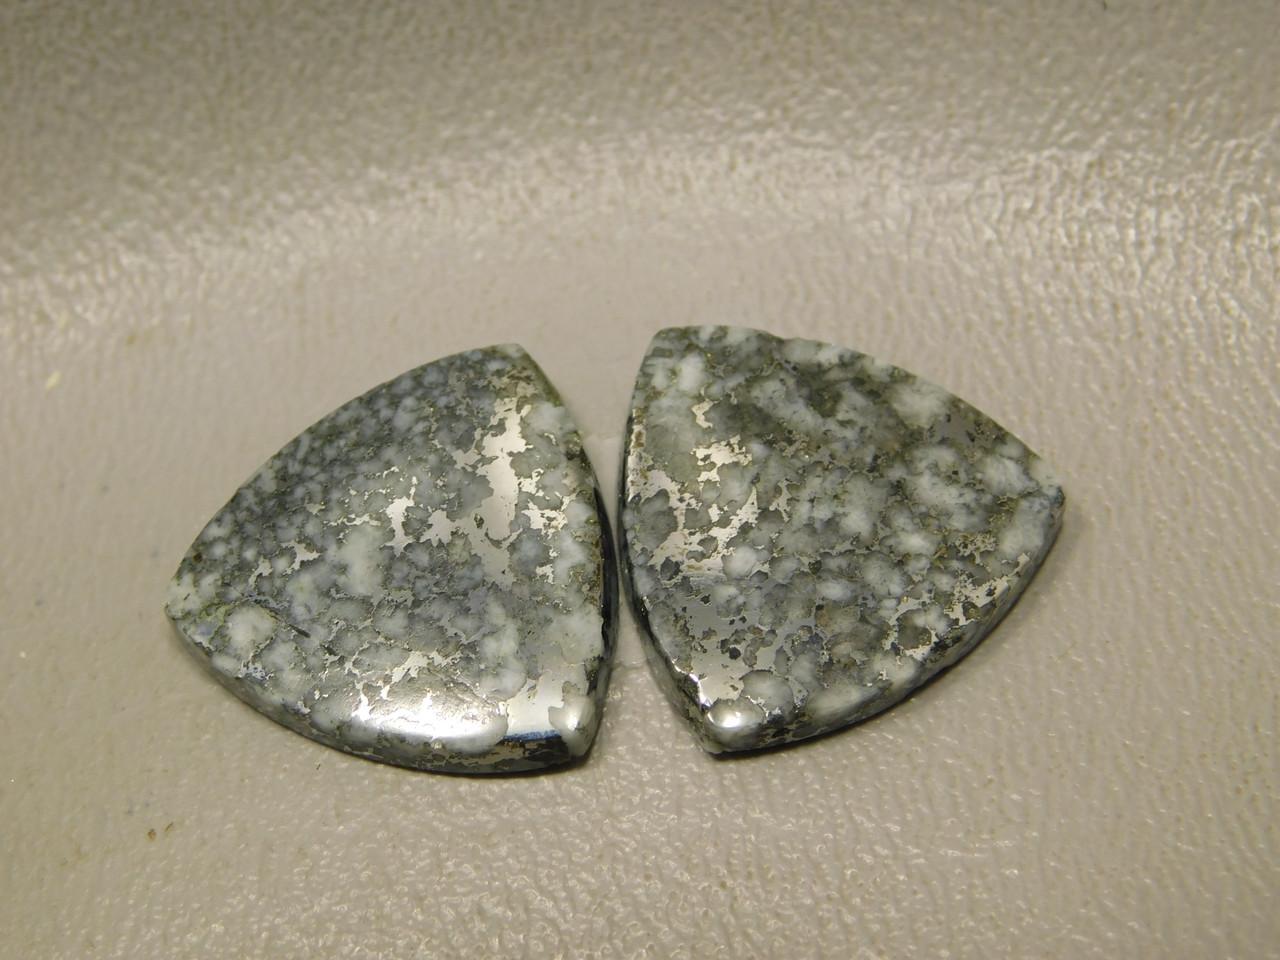 Mohawkite Cabochon 20 mm Trillions Earring Gemstone #12